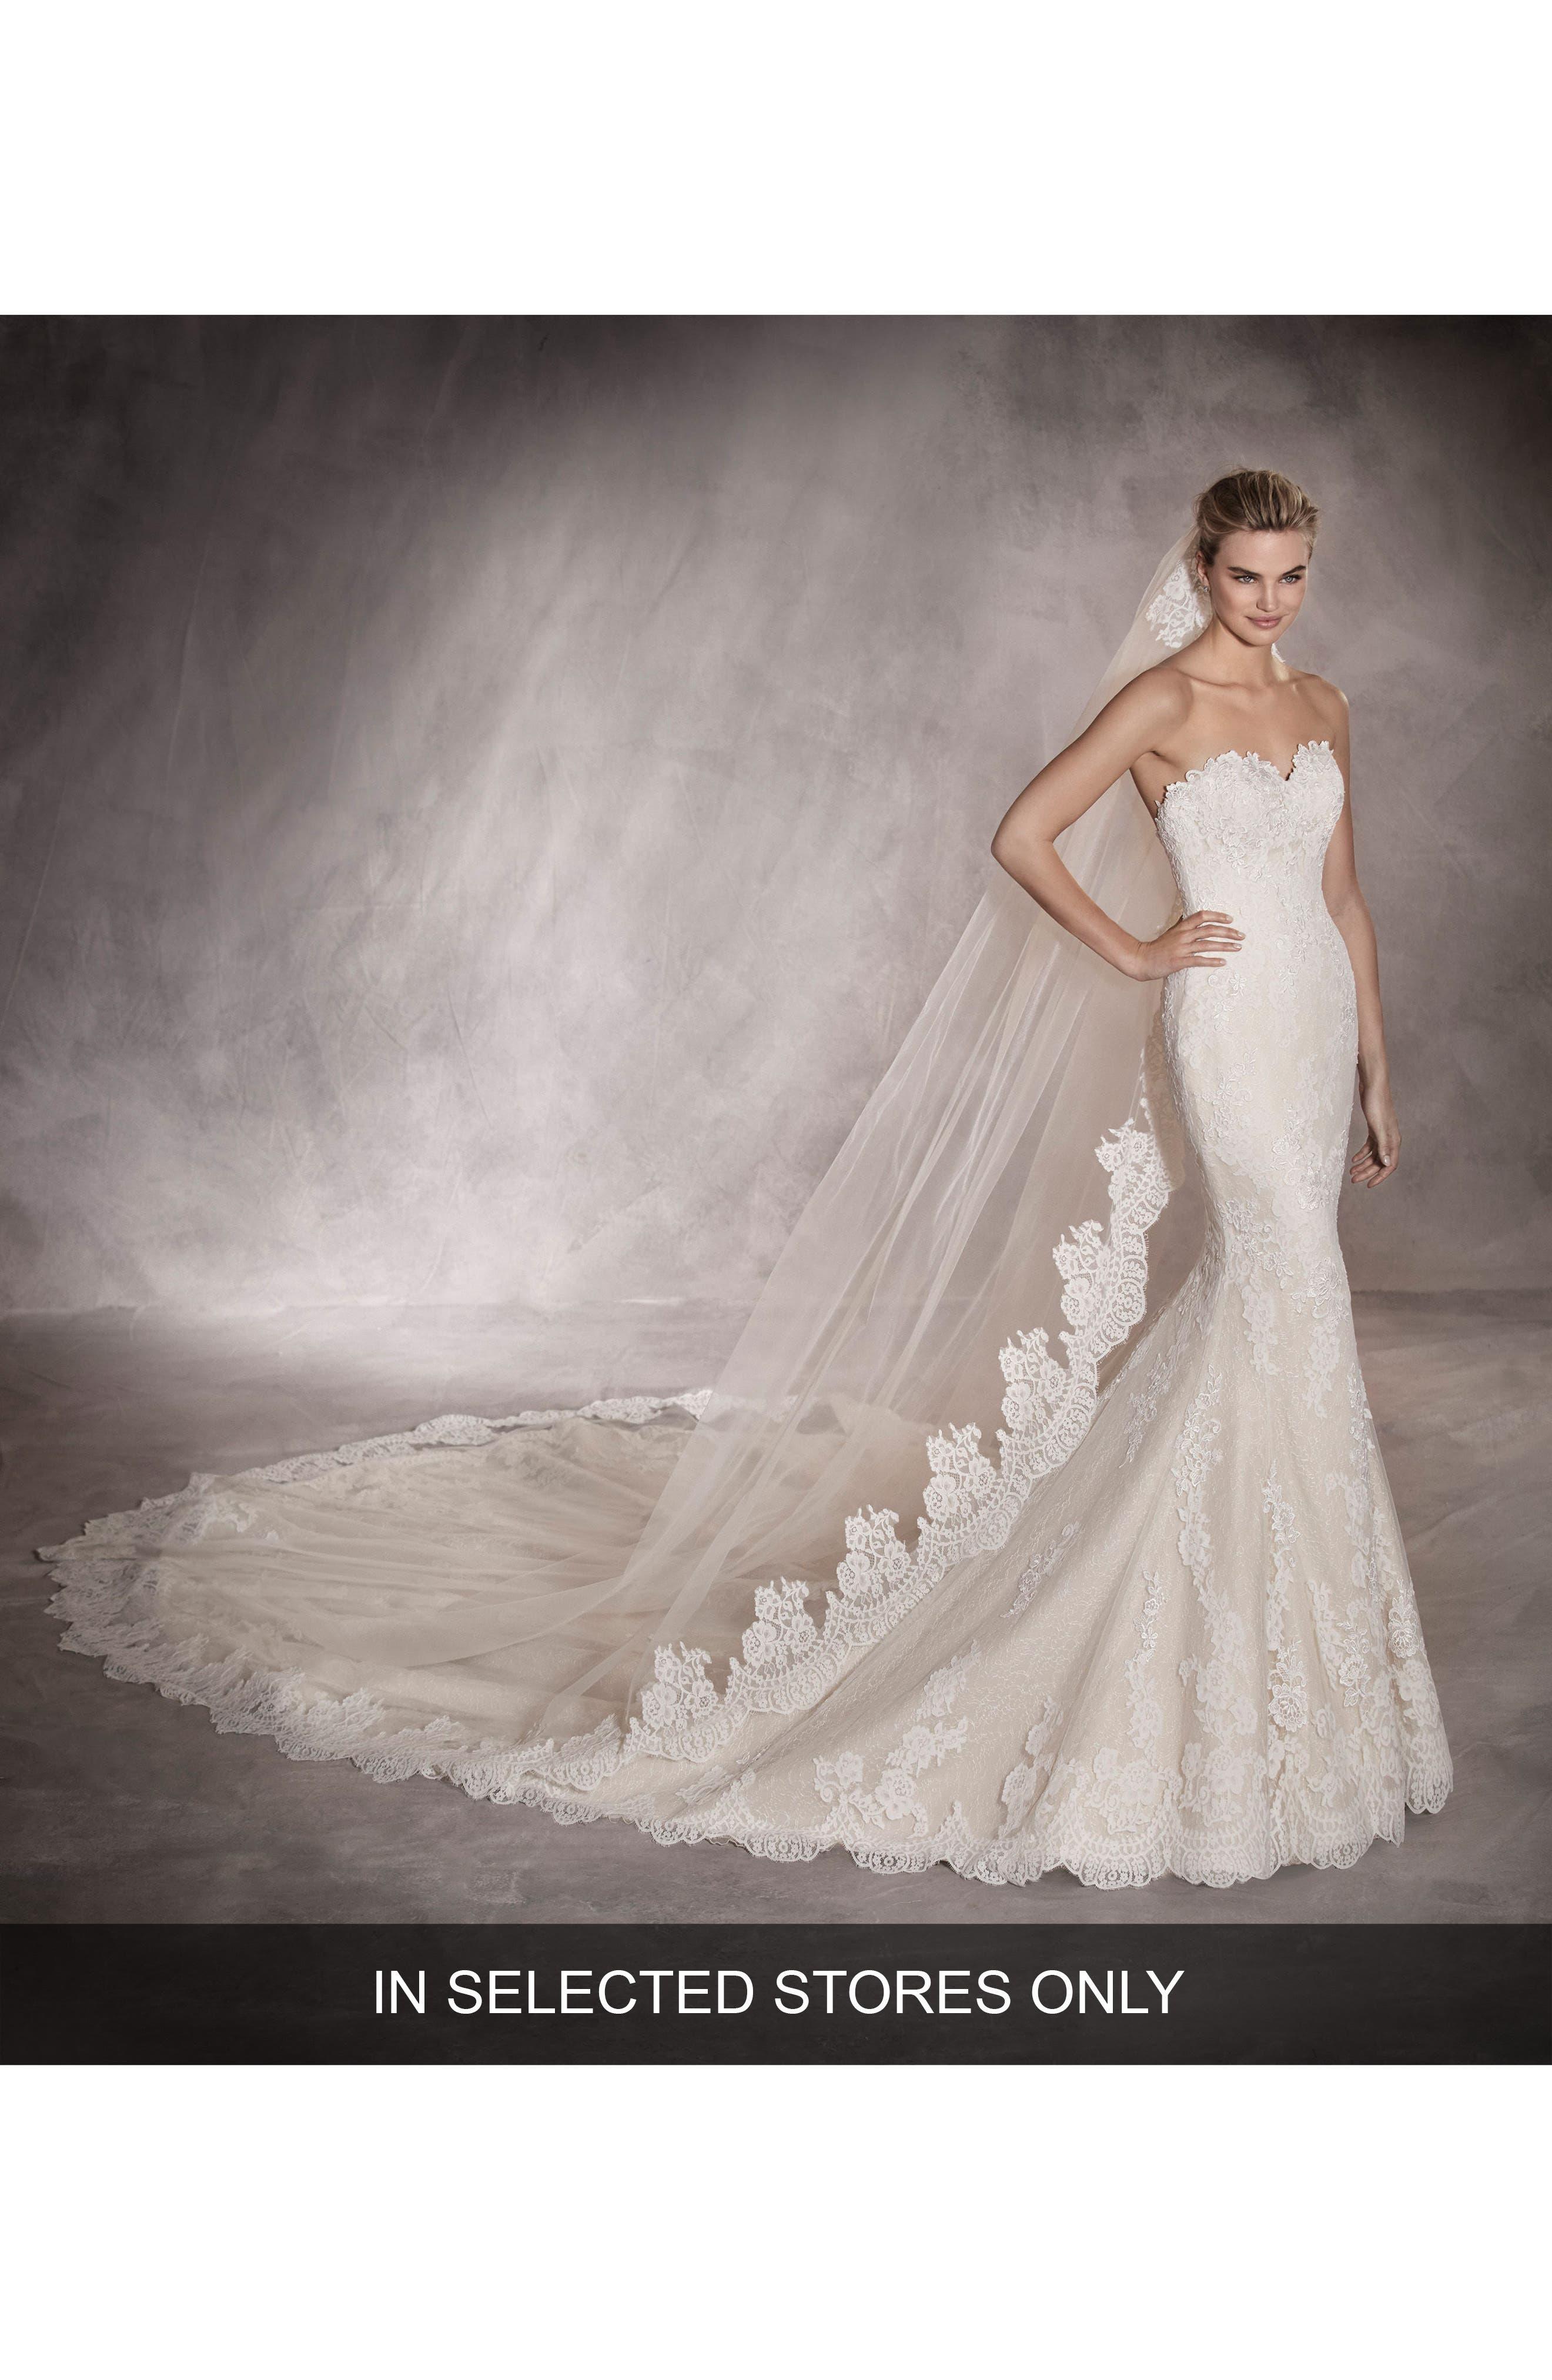 Alternate Image 1 Selected - Pronovias Princia Strapless Lace Mermaid Gown